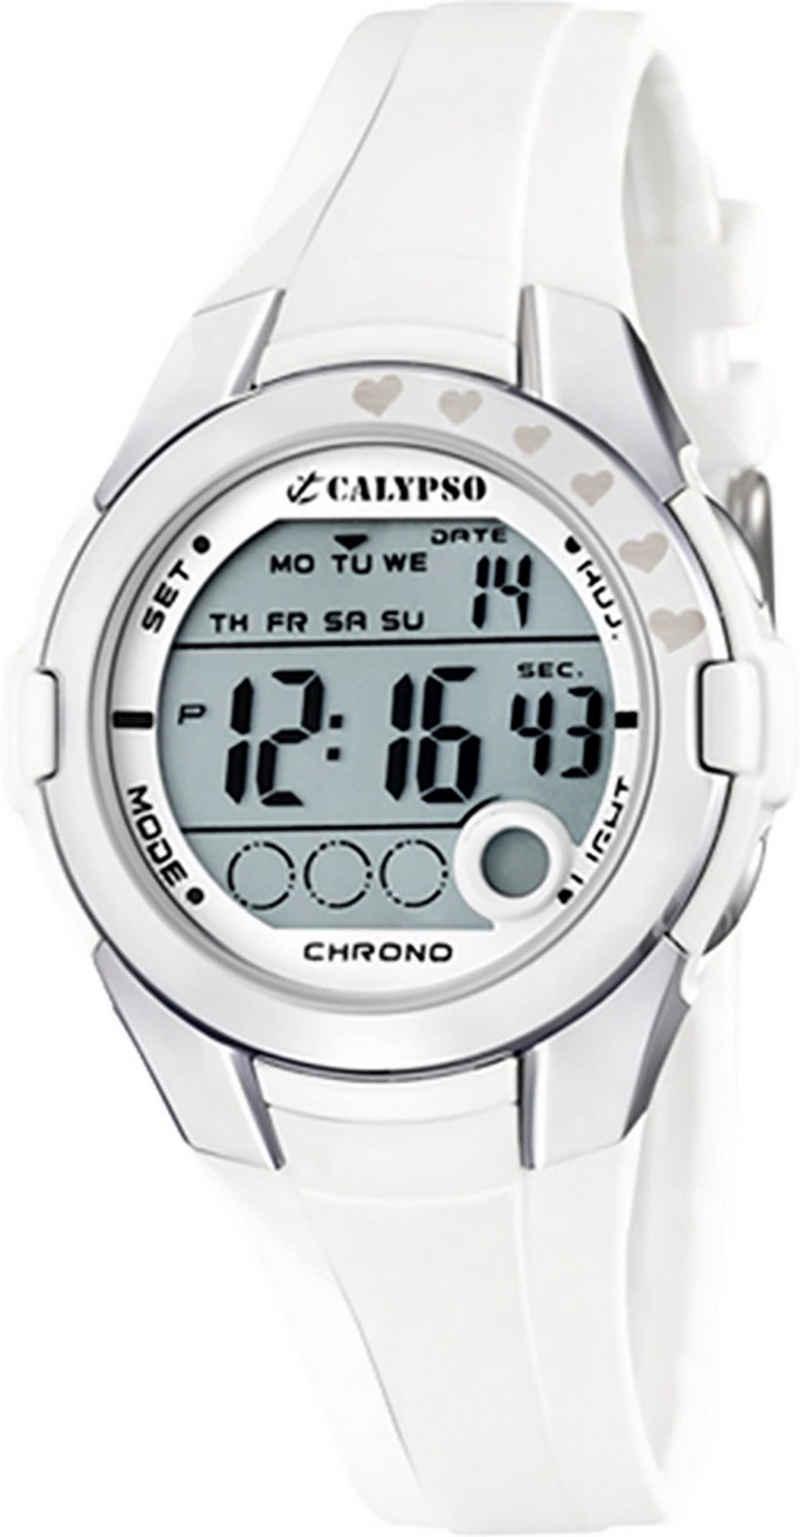 CALYPSO WATCHES Digitaluhr »UK5571/1 Calypso Kinder Uhr K5571/1 Kunststoffband«, (Digitaluhr), Kinder Armbanduhr rund, Kunststoffarmband weiß, Casual